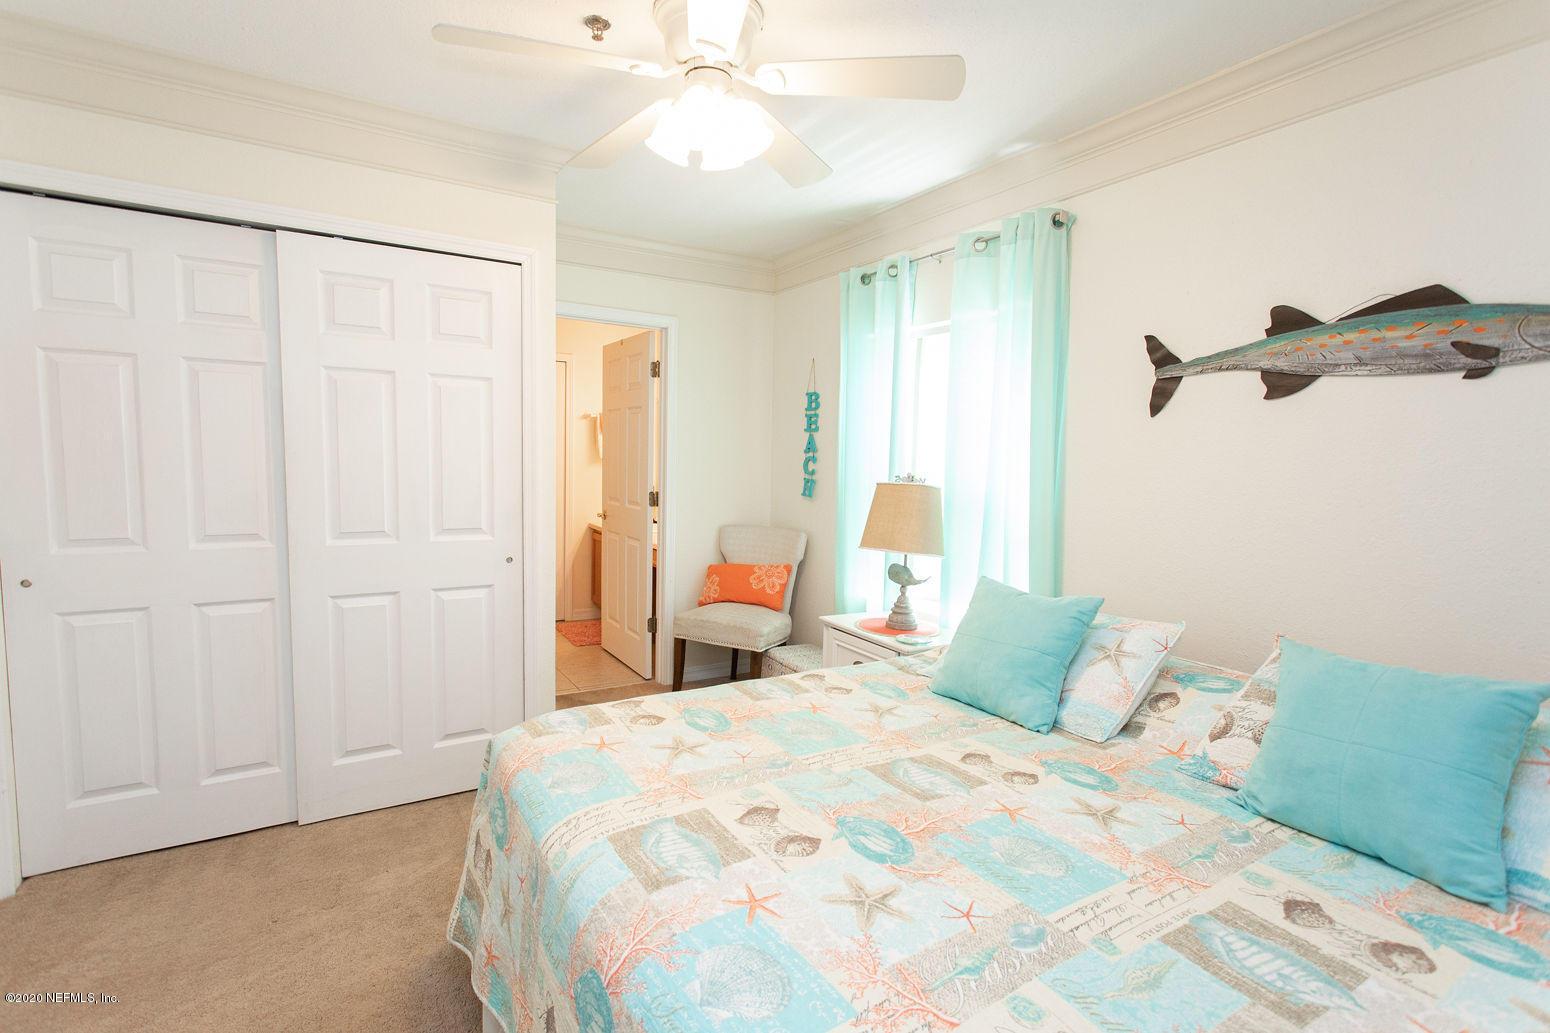 120 OCEAN HIBISCUS, ST AUGUSTINE, FLORIDA 32080, 2 Bedrooms Bedrooms, ,2 BathroomsBathrooms,Residential,For sale,OCEAN HIBISCUS,1083197